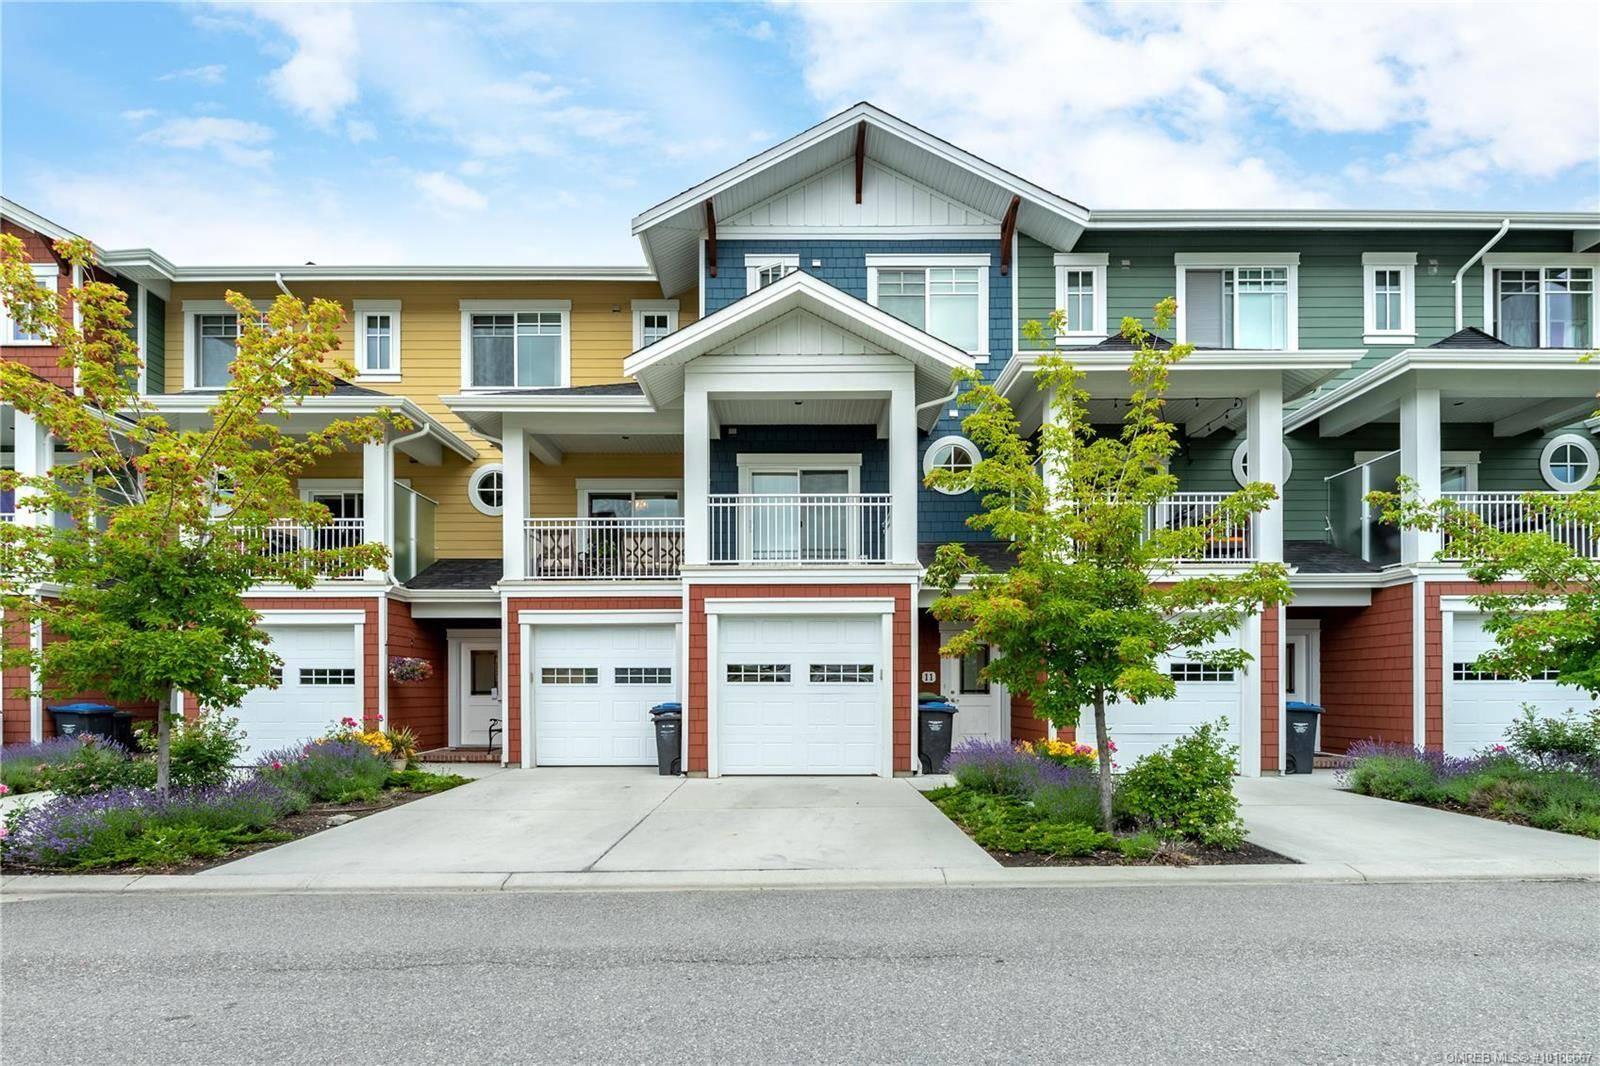 Townhouse for sale at 433 Mccarren Ave Unit 11 Kelowna British Columbia - MLS: 10186667